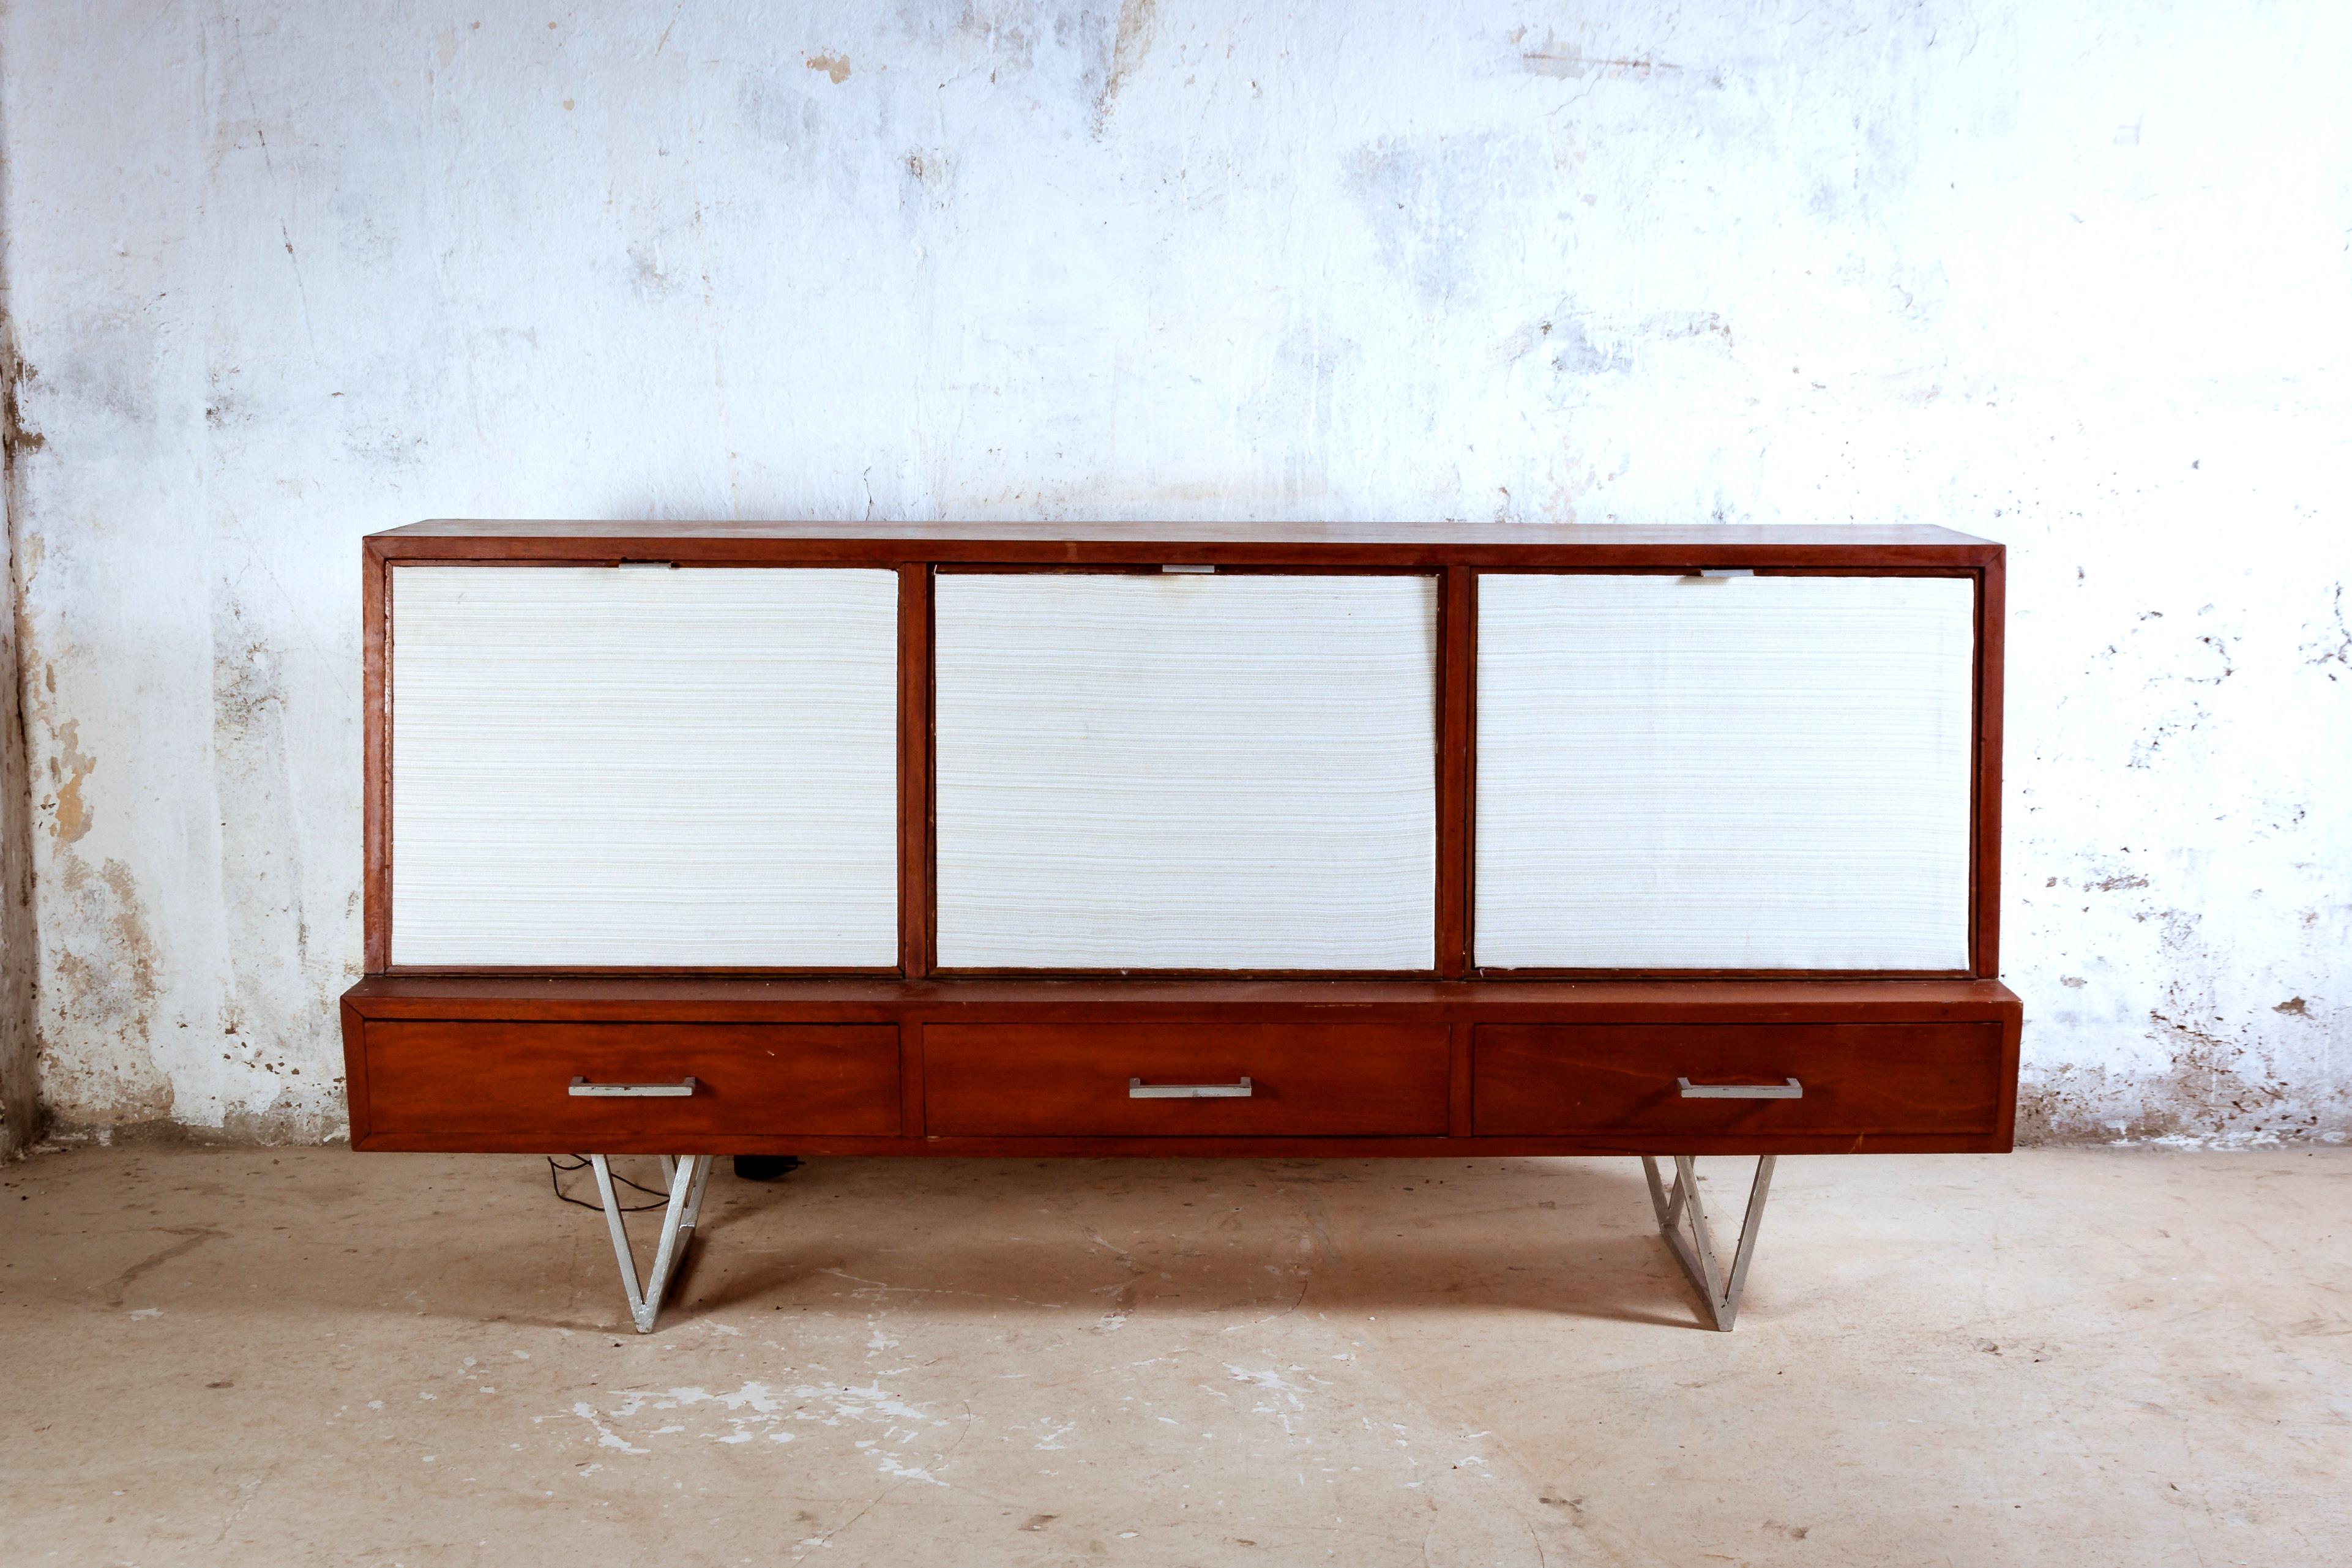 Mueble tocadiscos de los a os 60 polonium 209 - Muebles anos 60 ...